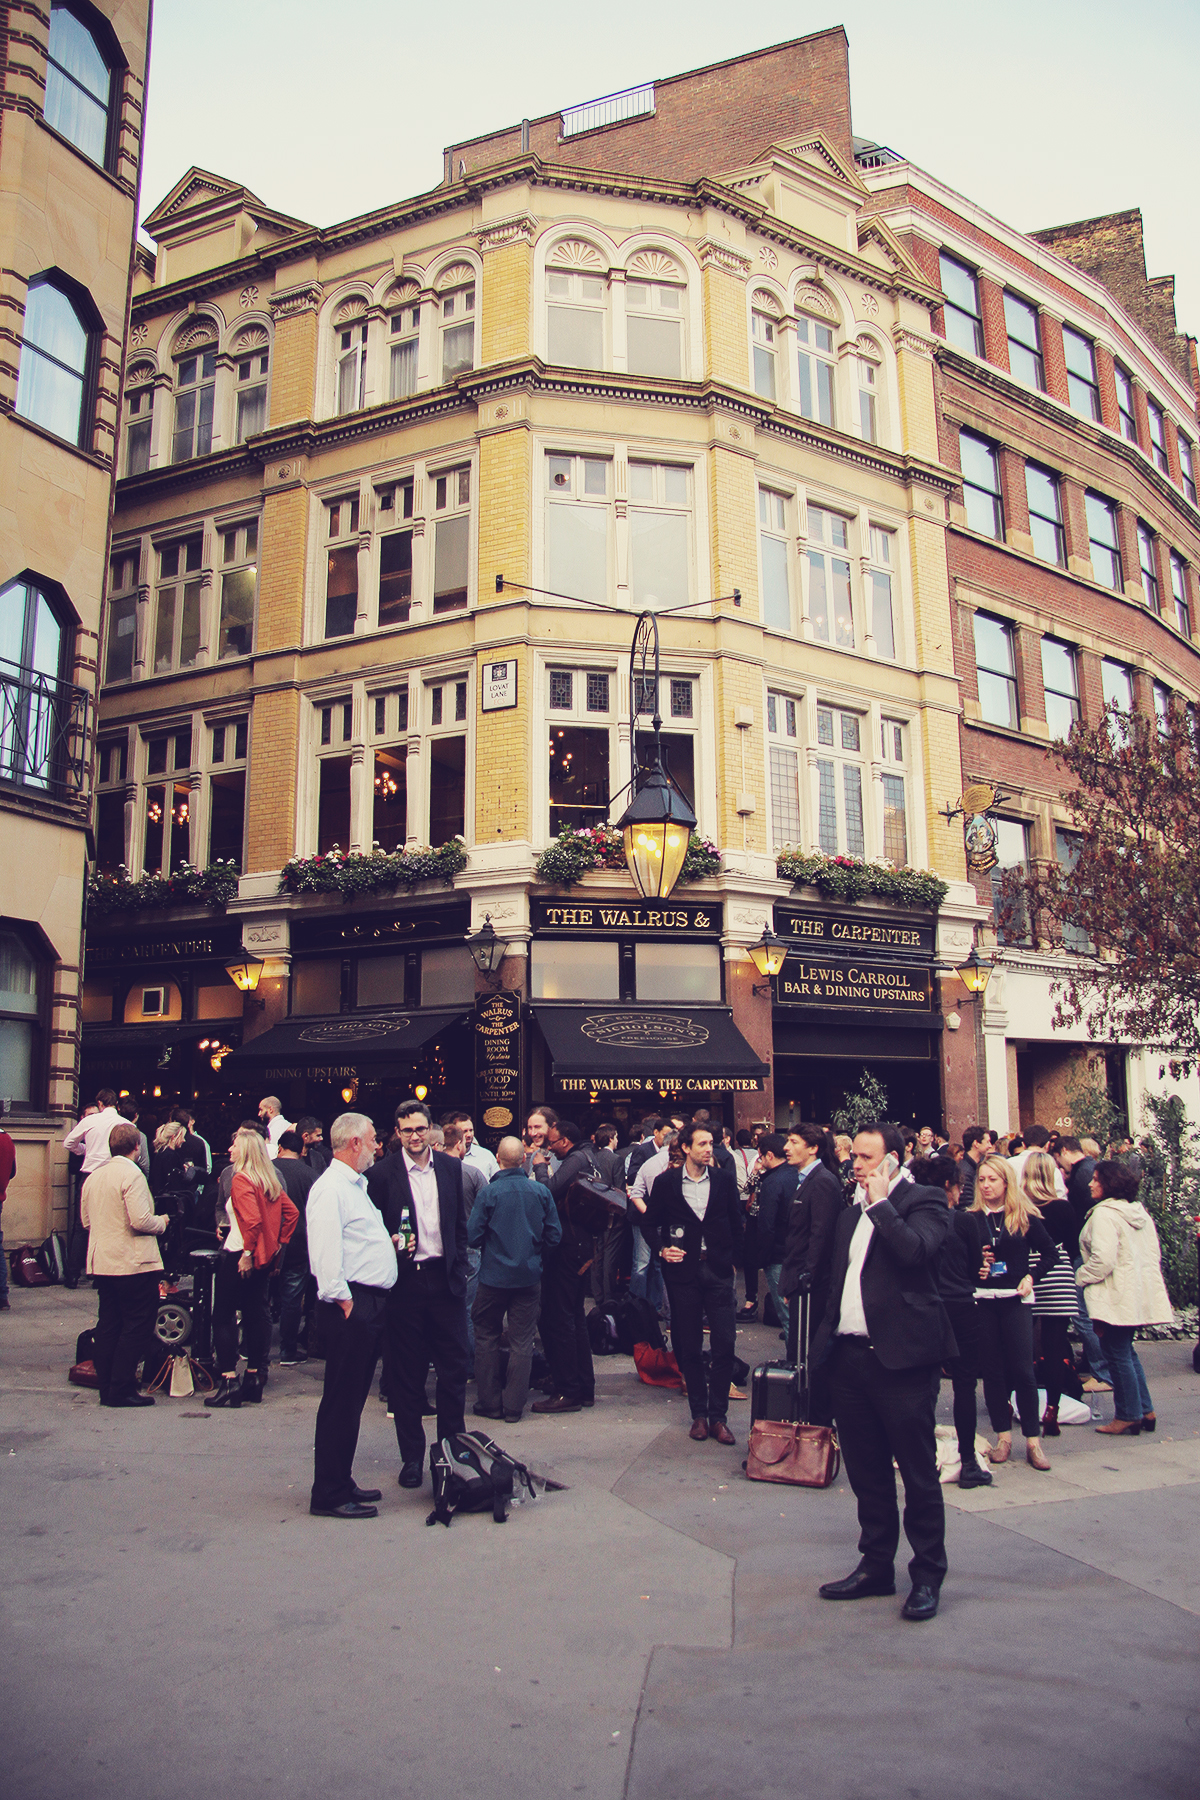 london-pub-in-bank